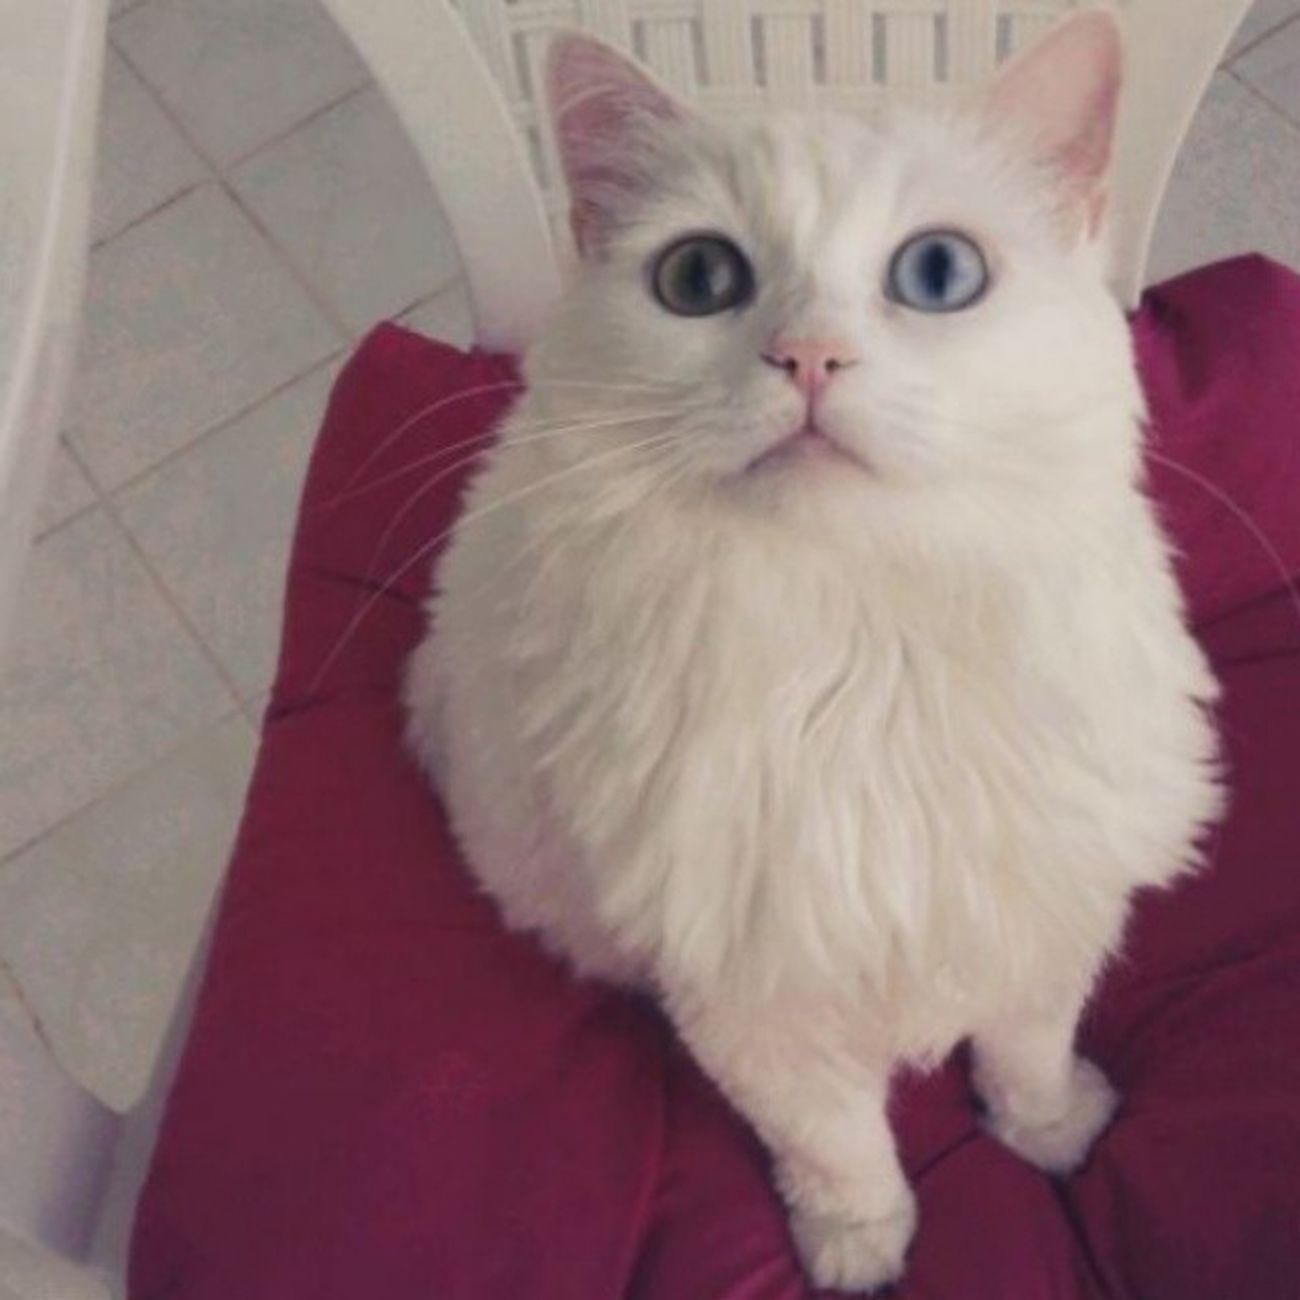 Bi lokmacik ballı lokma mayaa_2 Benimkedim Maya Mayukhan Cat kedi missgibiolduk caniçi vankedisi vancat instacat instagram